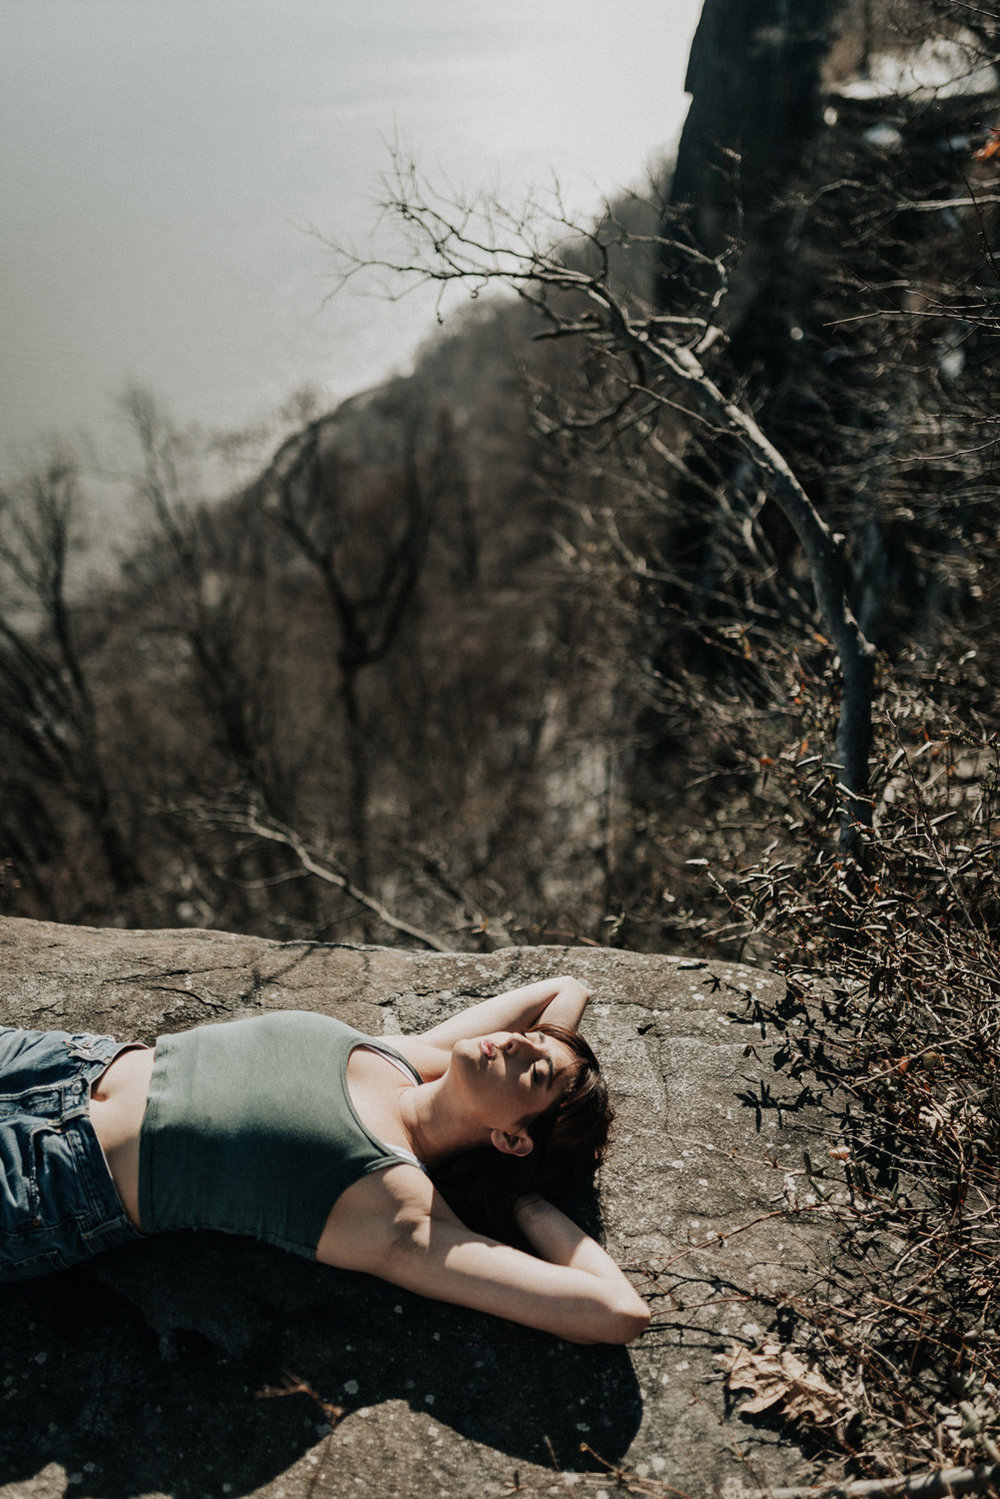 KyleWillisPhoto-Kyle-Willis-Photography-New-Jersey-Portland-Oregon-Photographer-Englewood-Cliffs-Palisades-Parkway-Overlook-Kosovare-Ibrahimaj-Hudson-River